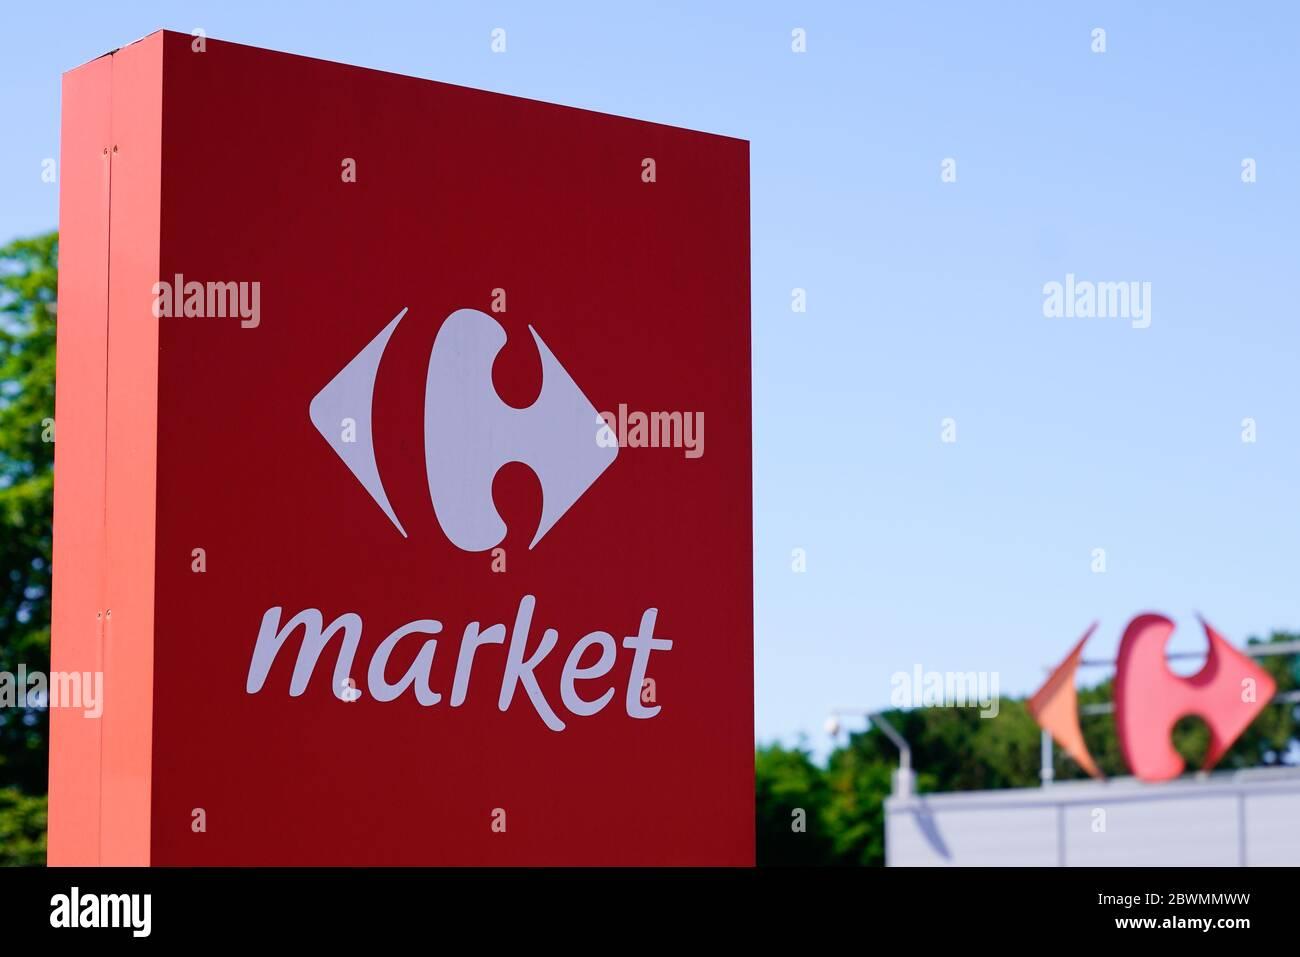 https www alamy com bordeaux aquitaine france 05 05 2020 carrefour market store sign and logo on hypermarket shop image360029205 html